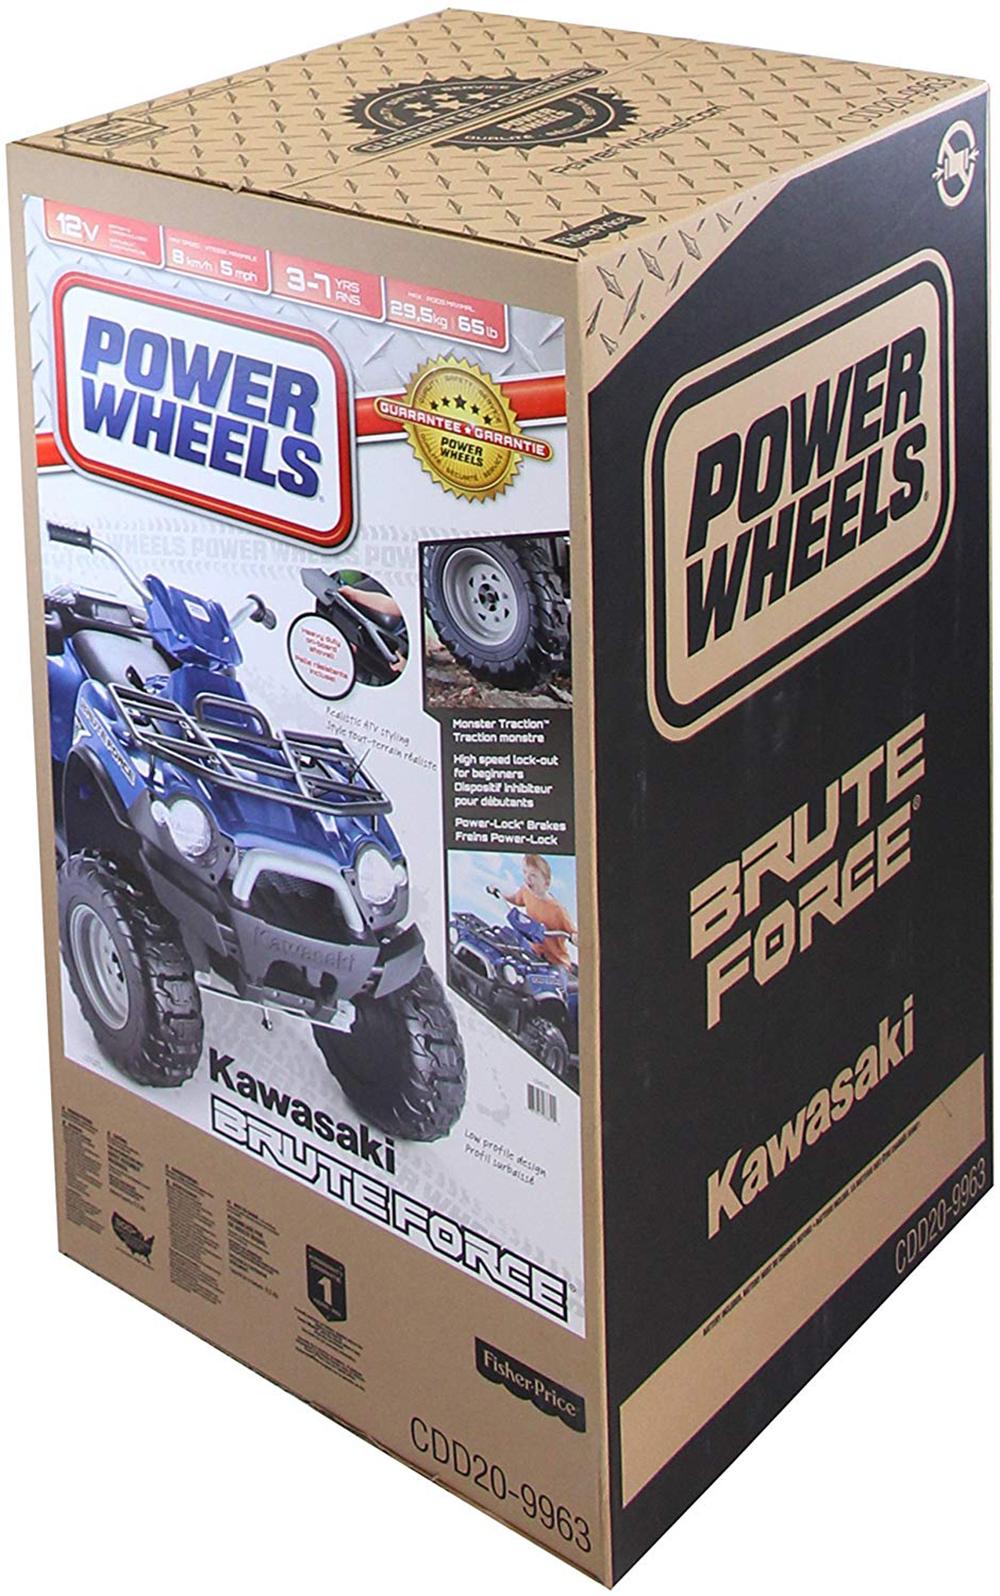 Power Wheels - Kawasaki Force